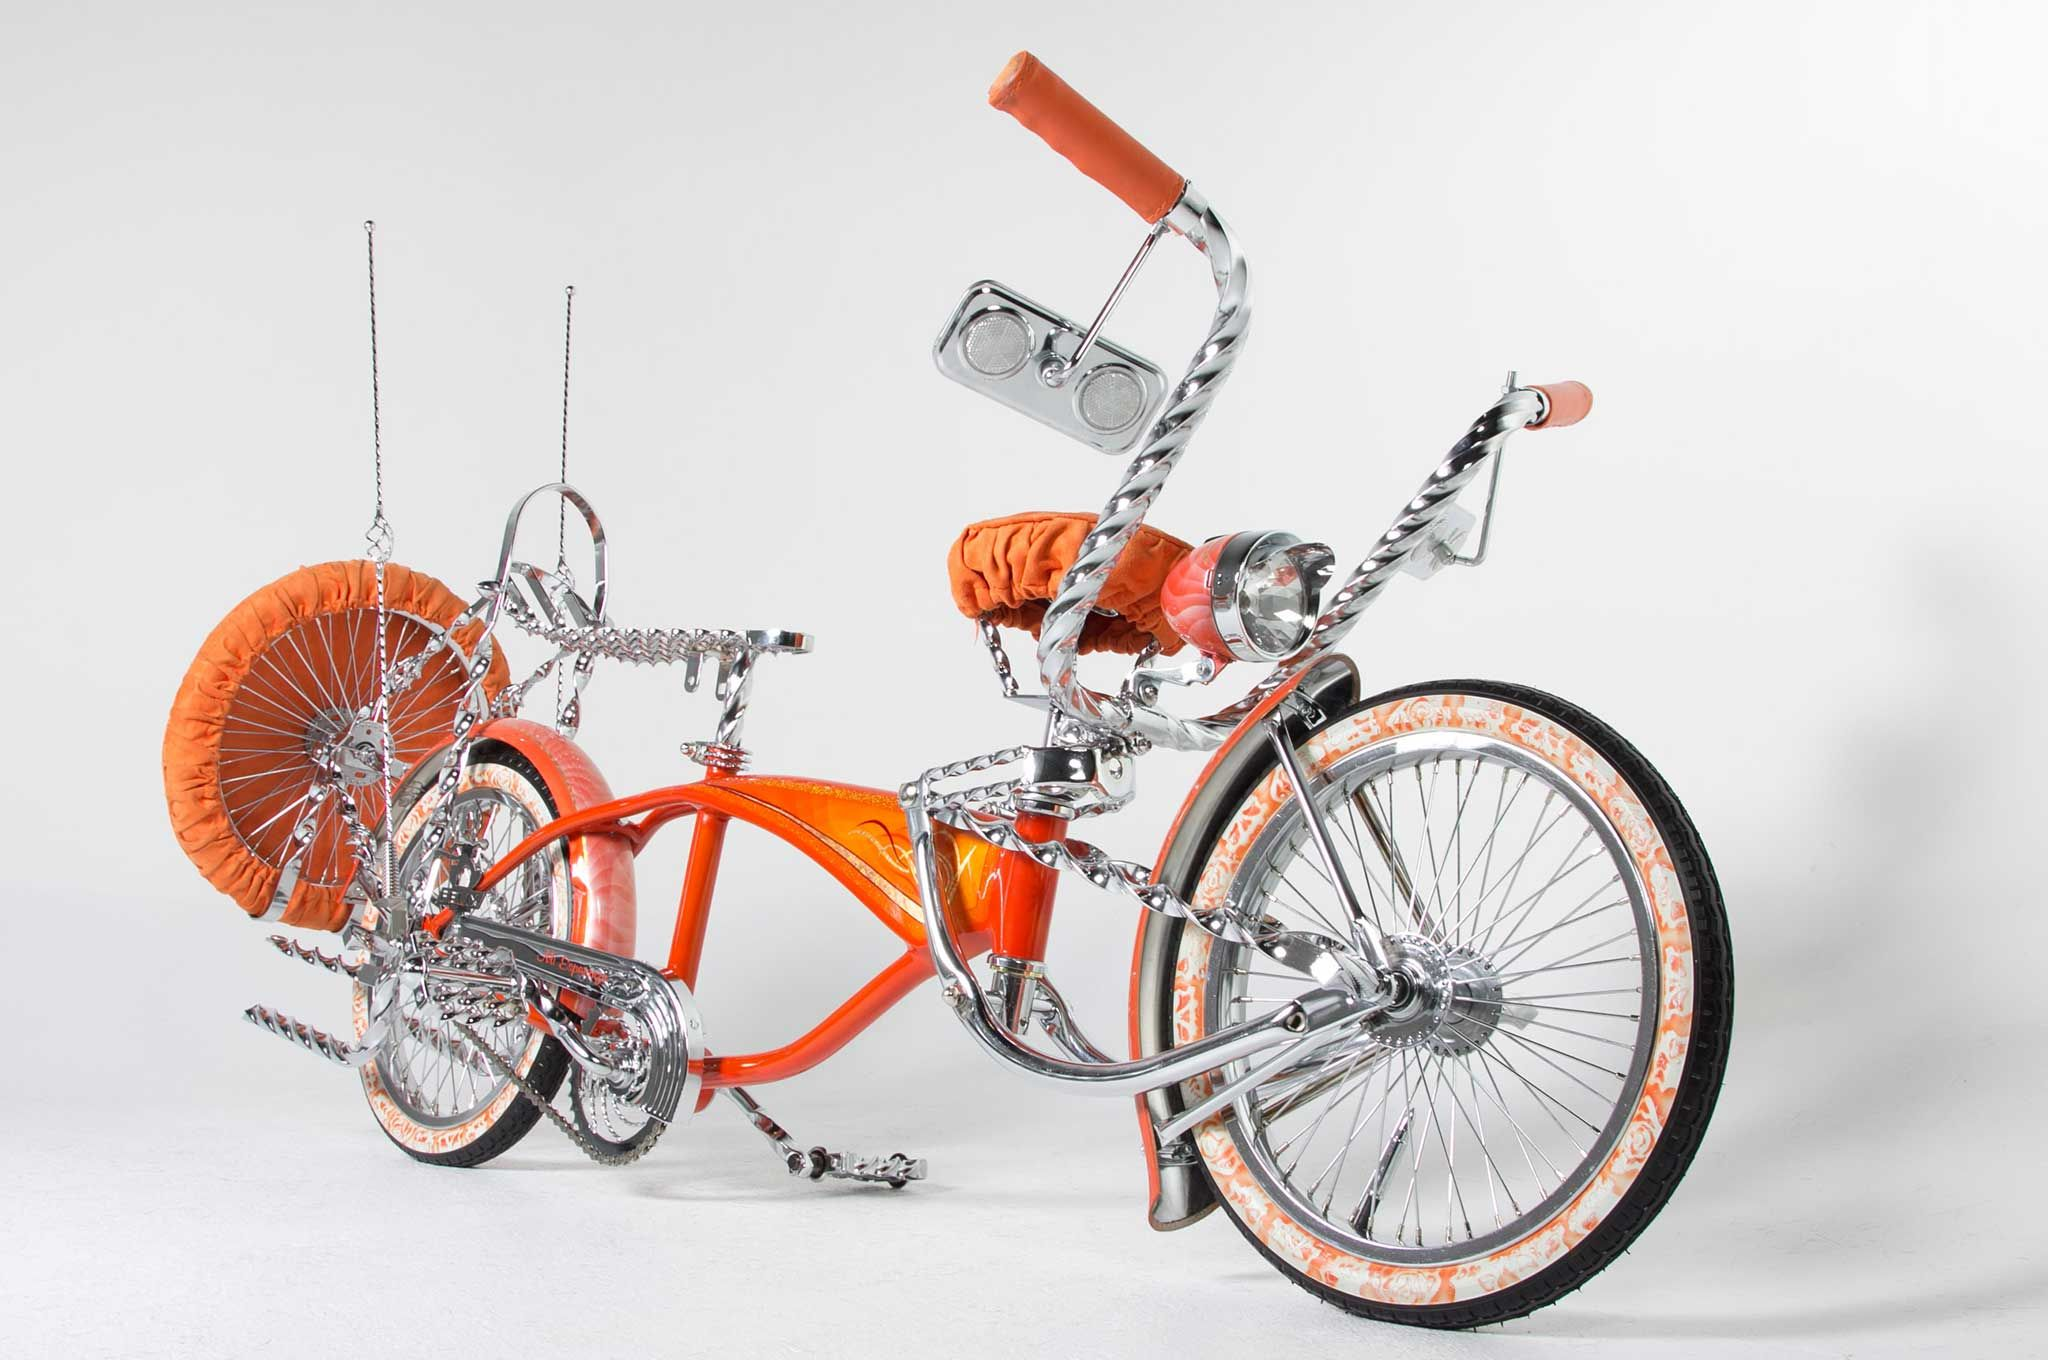 When Gabriel Ureno first got his 1996 16-inch Lowrider Bike from his ...